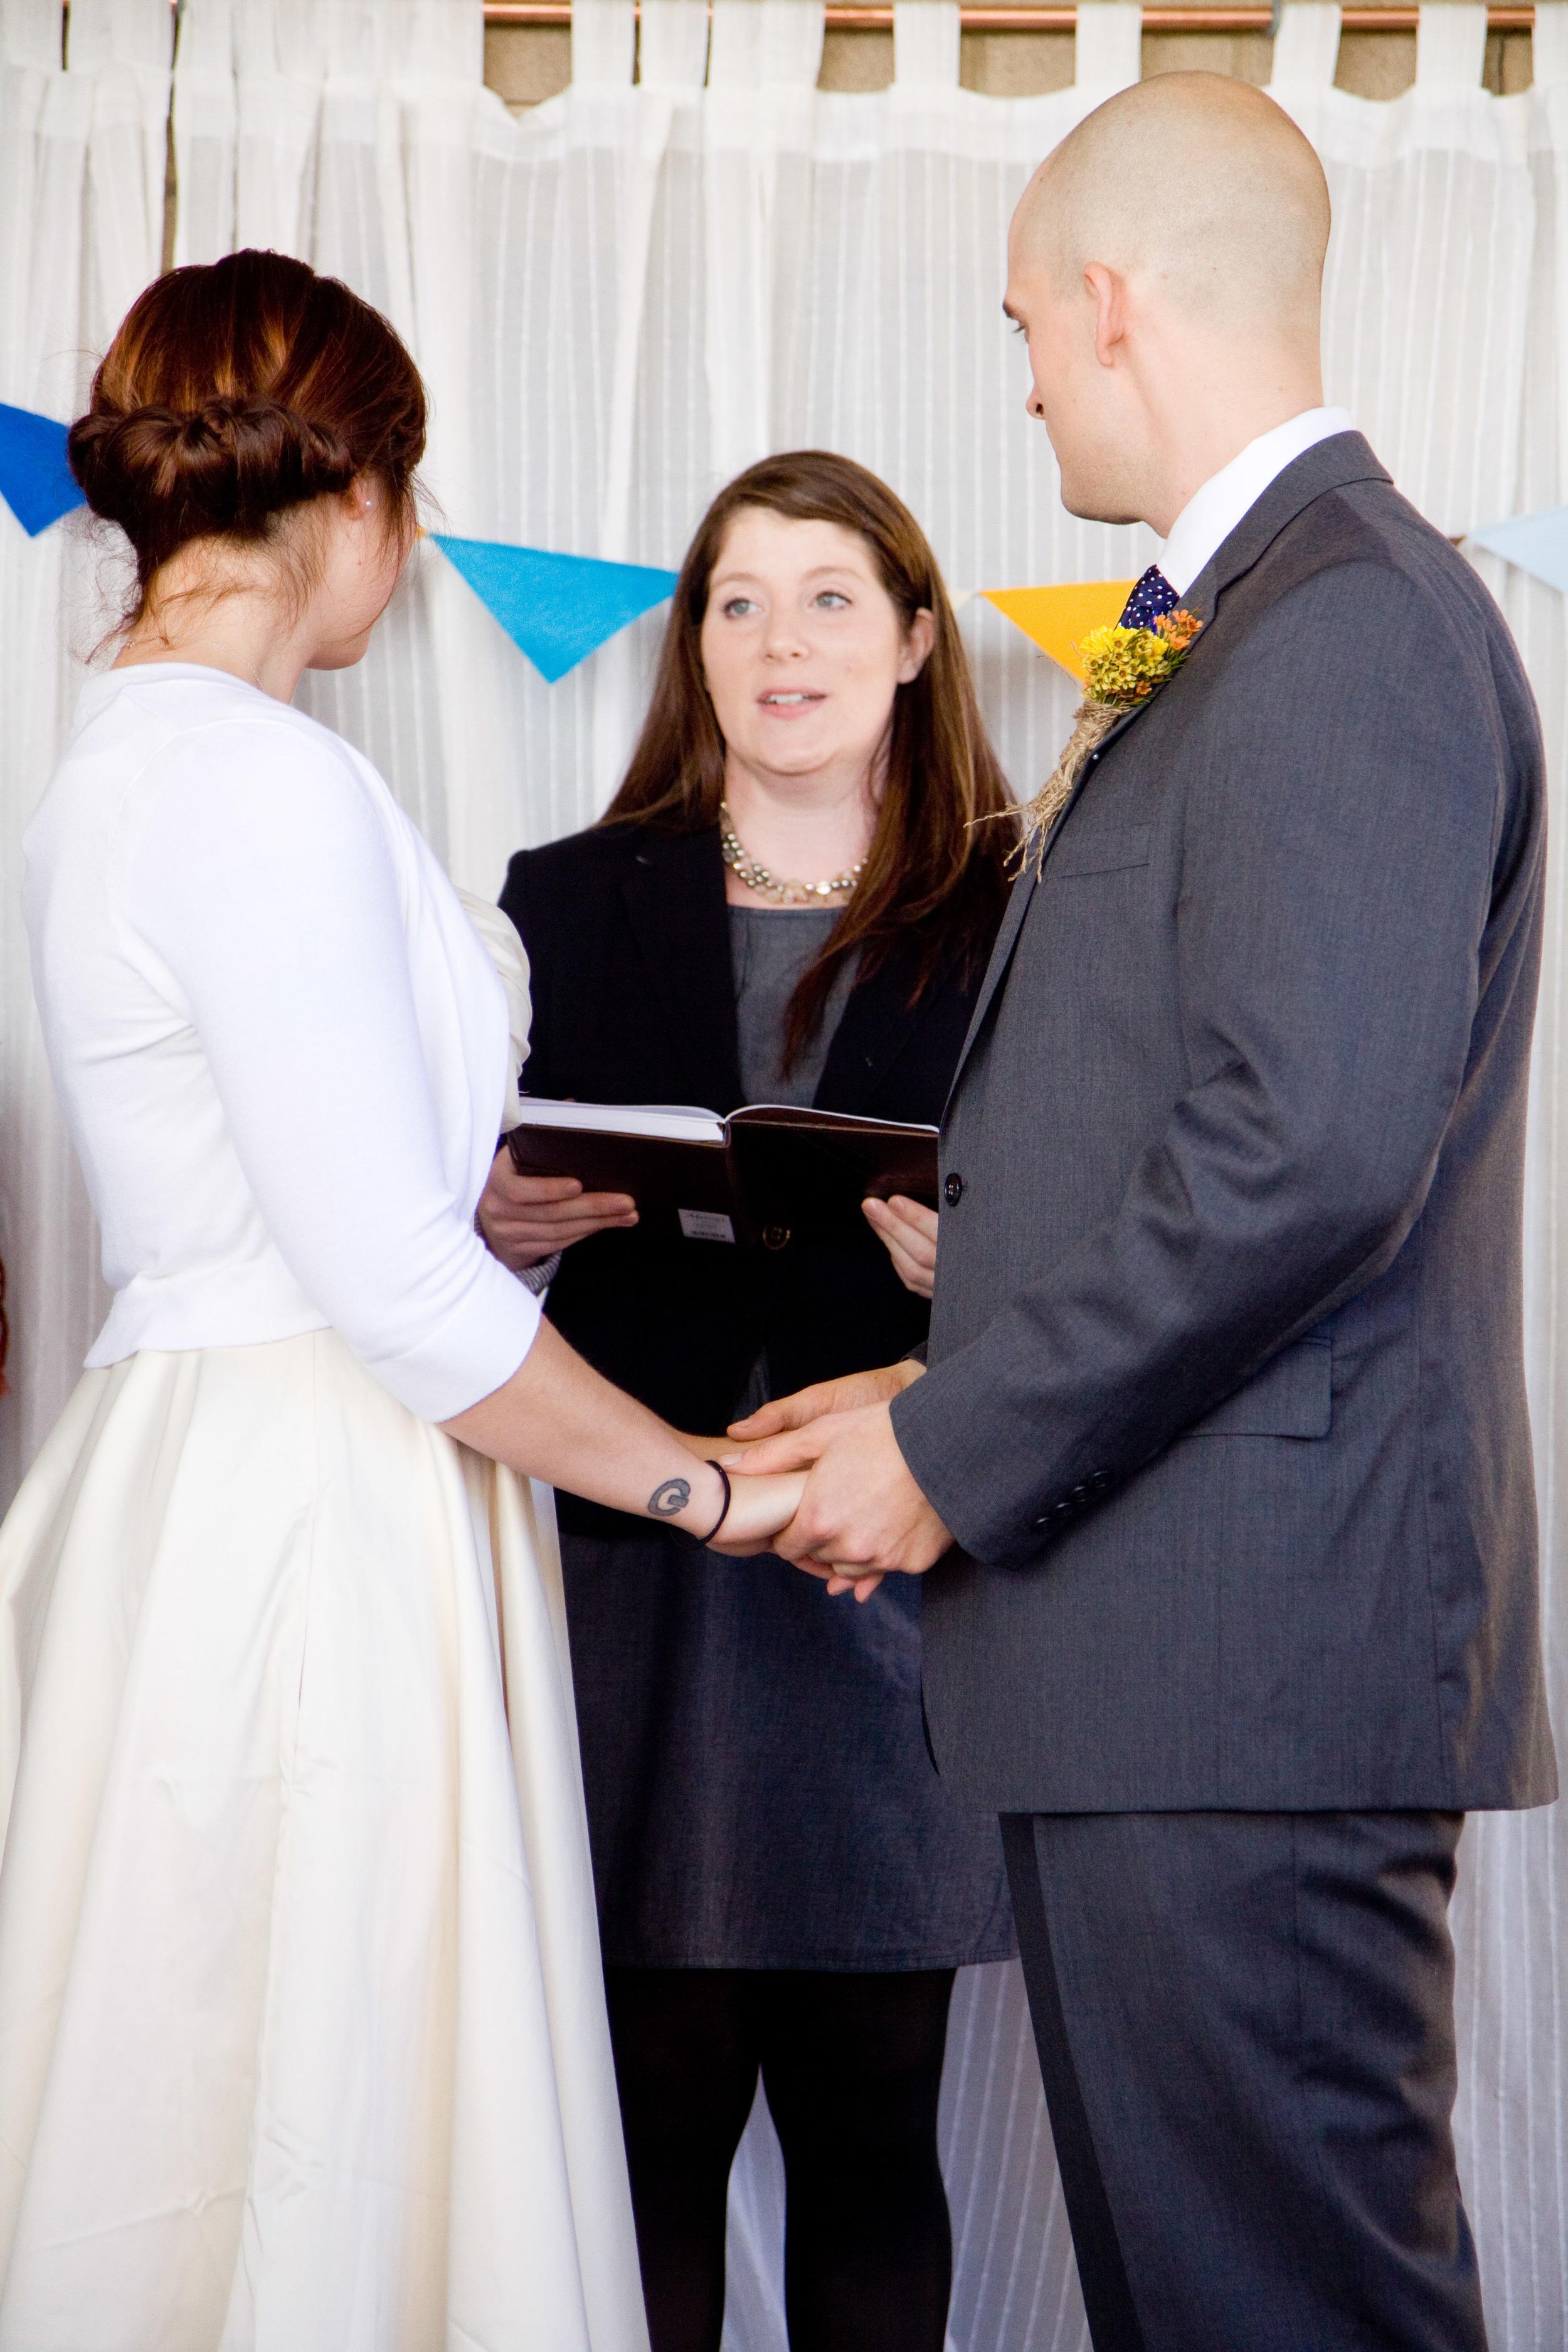 Wilson Bickel Wedding - Reception and Ceremony (104 of 526).jpg